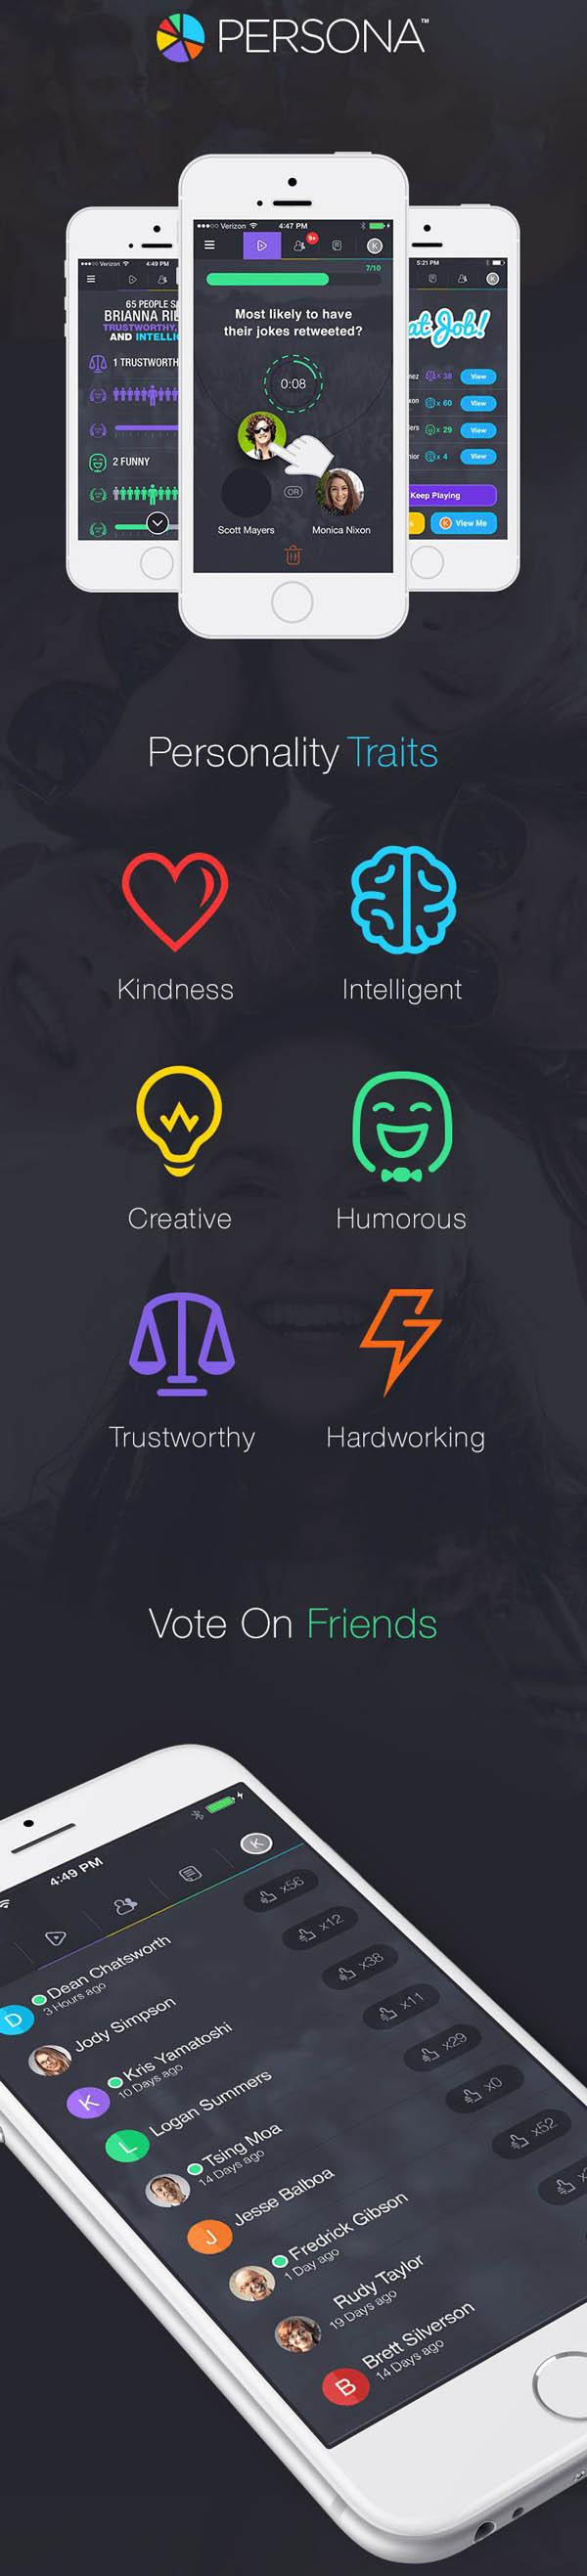 Persona-App